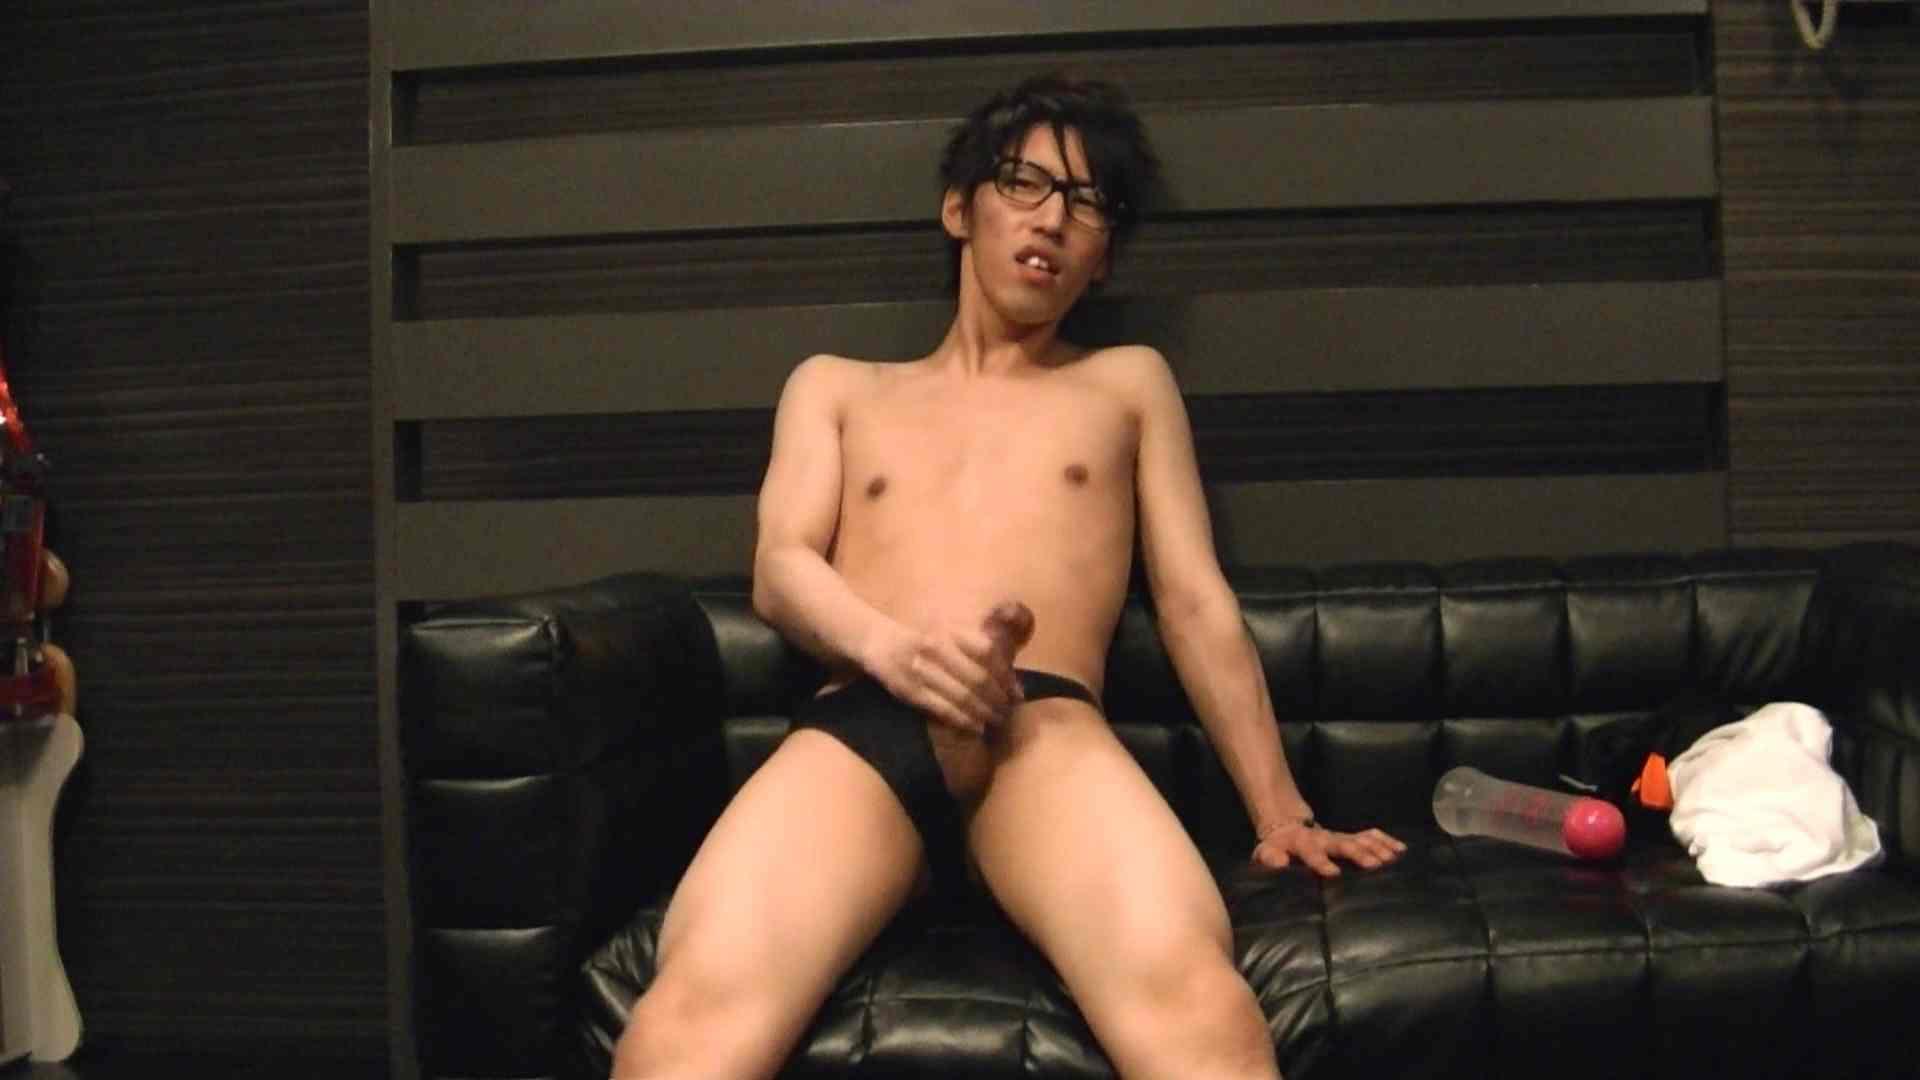 Mr.オナックスさん投稿!HD 貴方のオナニー三万円で撮影させてください。VOL.04 スリム美少年系ジャニ系 ゲイエロビデオ画像 55連発 6